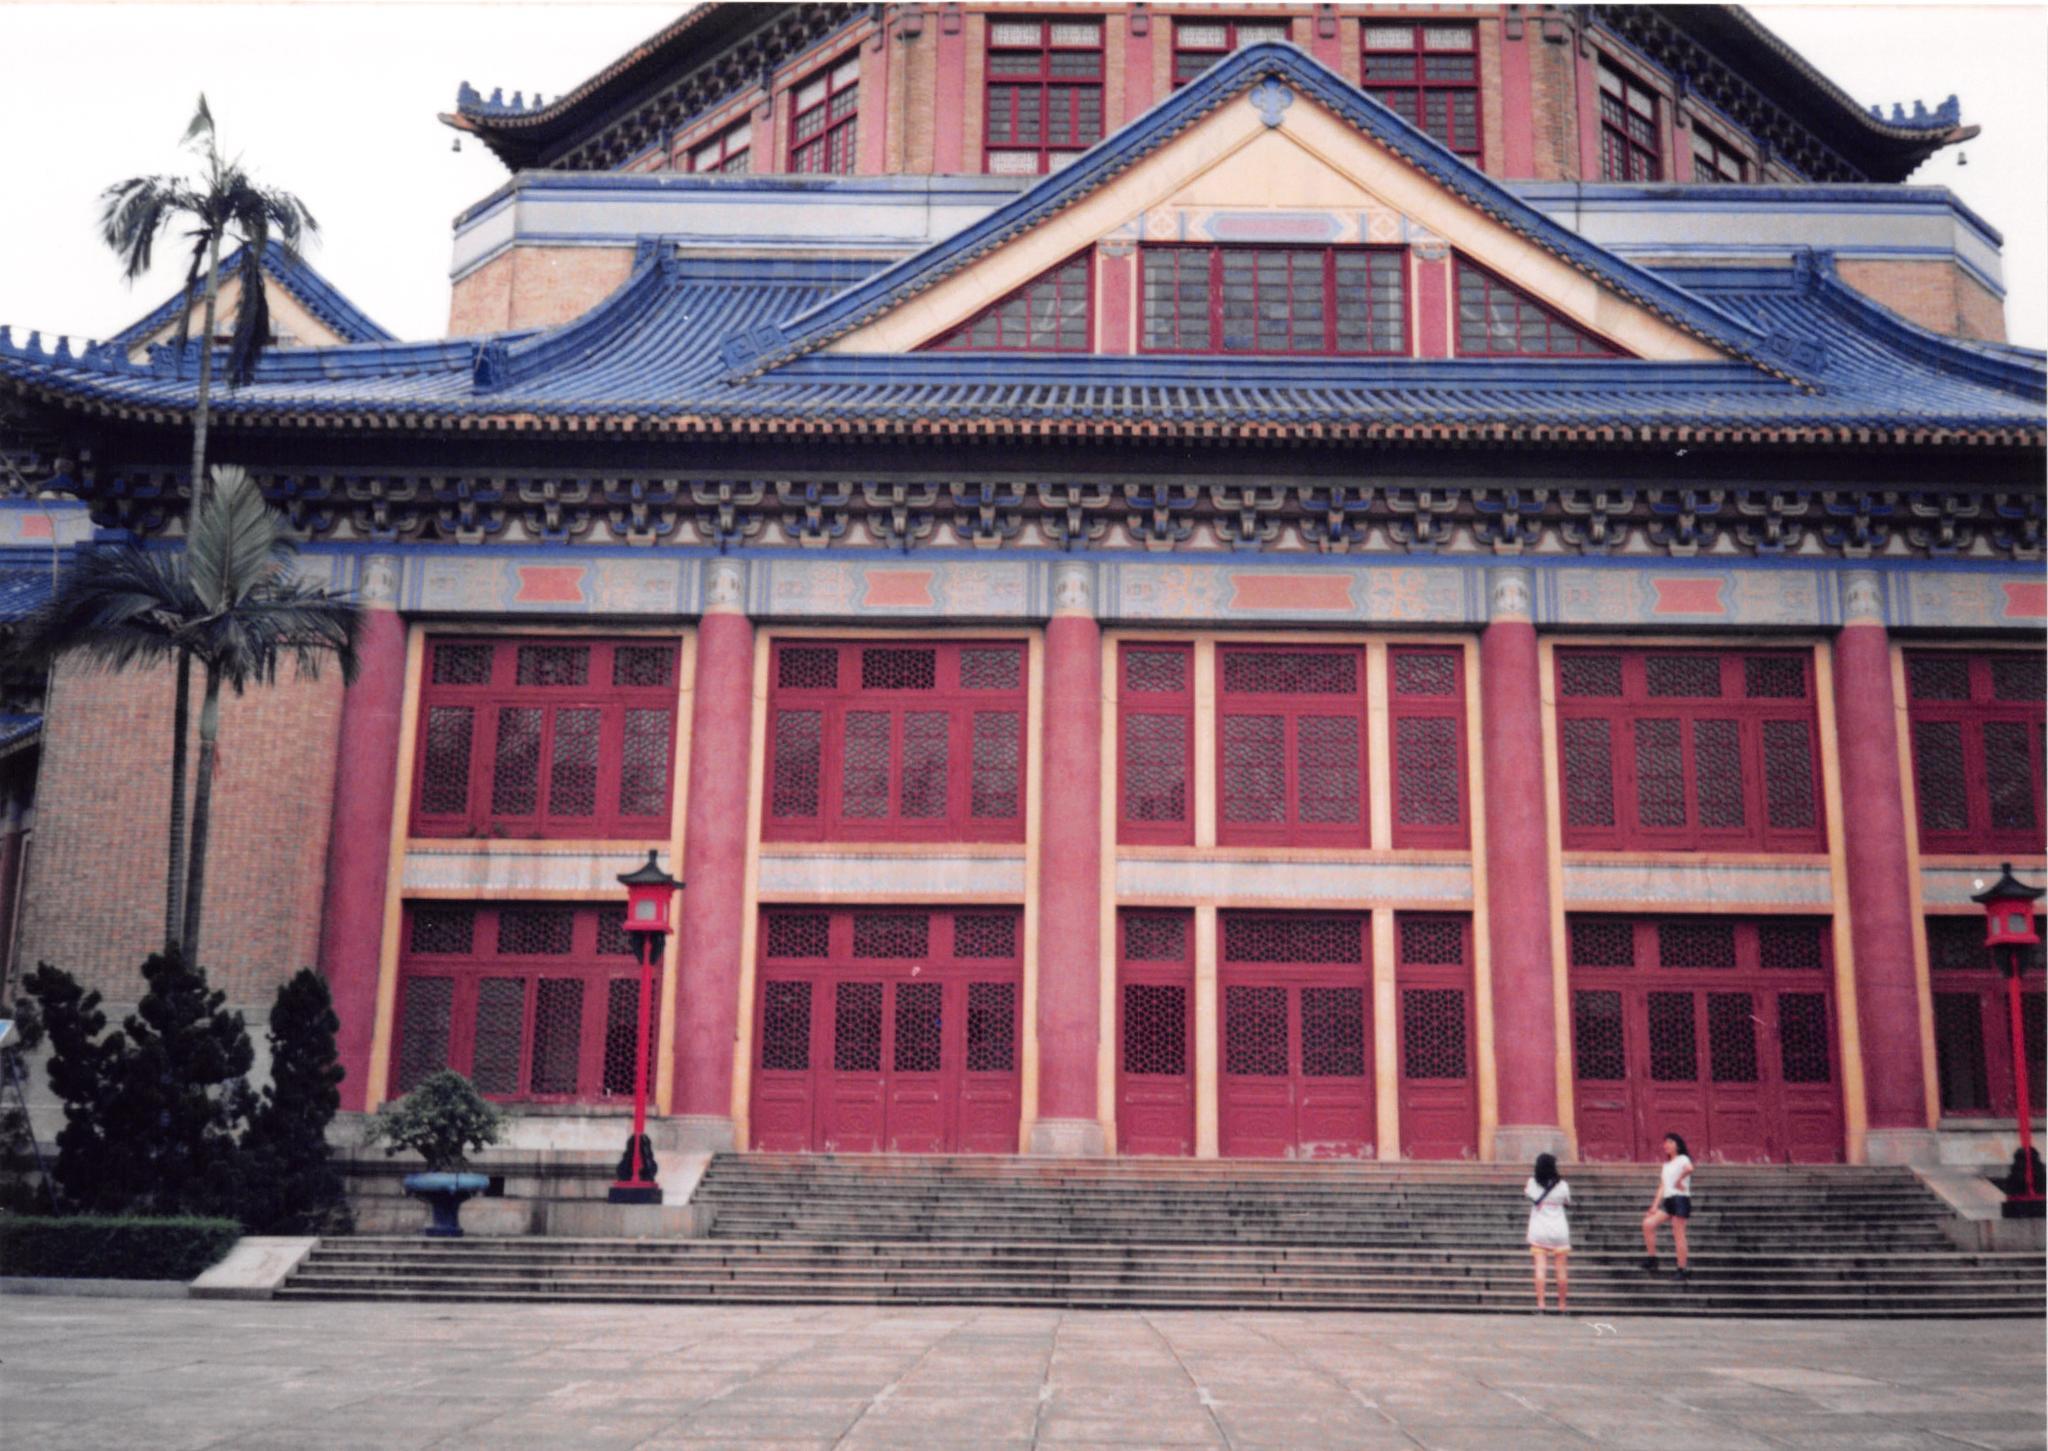 China school trip by John Schneyer